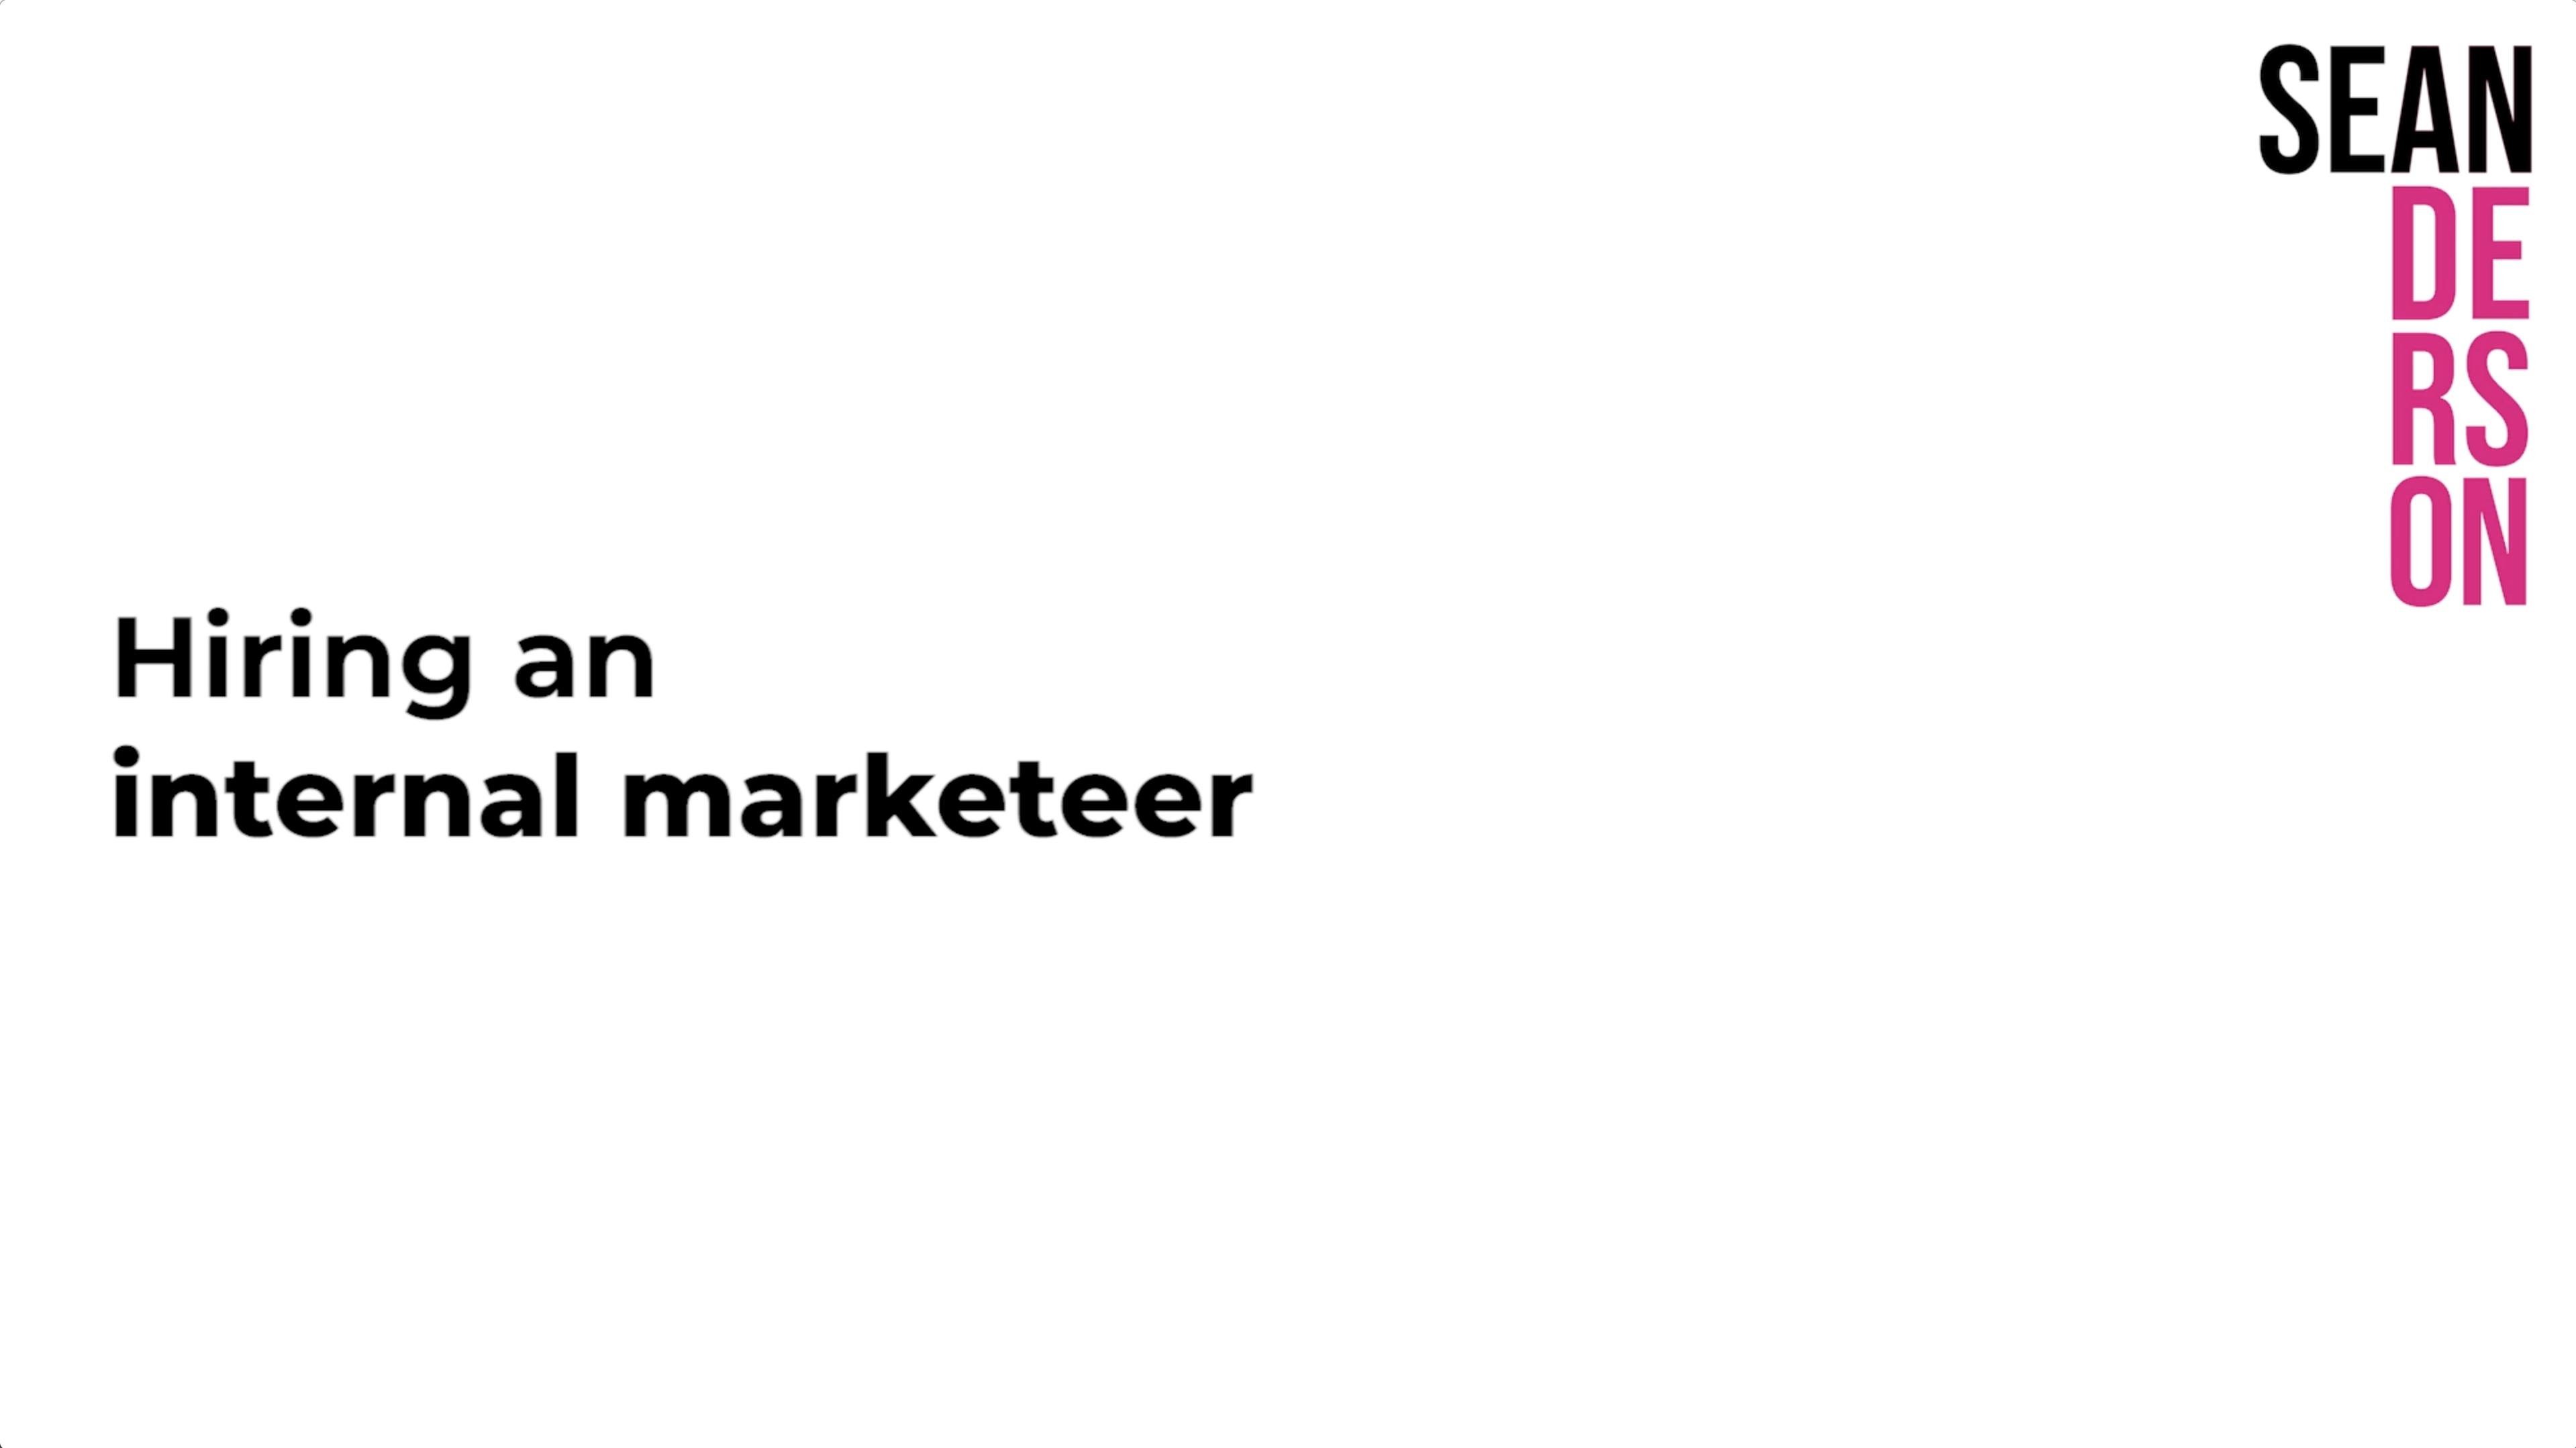 Sean Video Blog 2 - Hiring Internal Marketeer